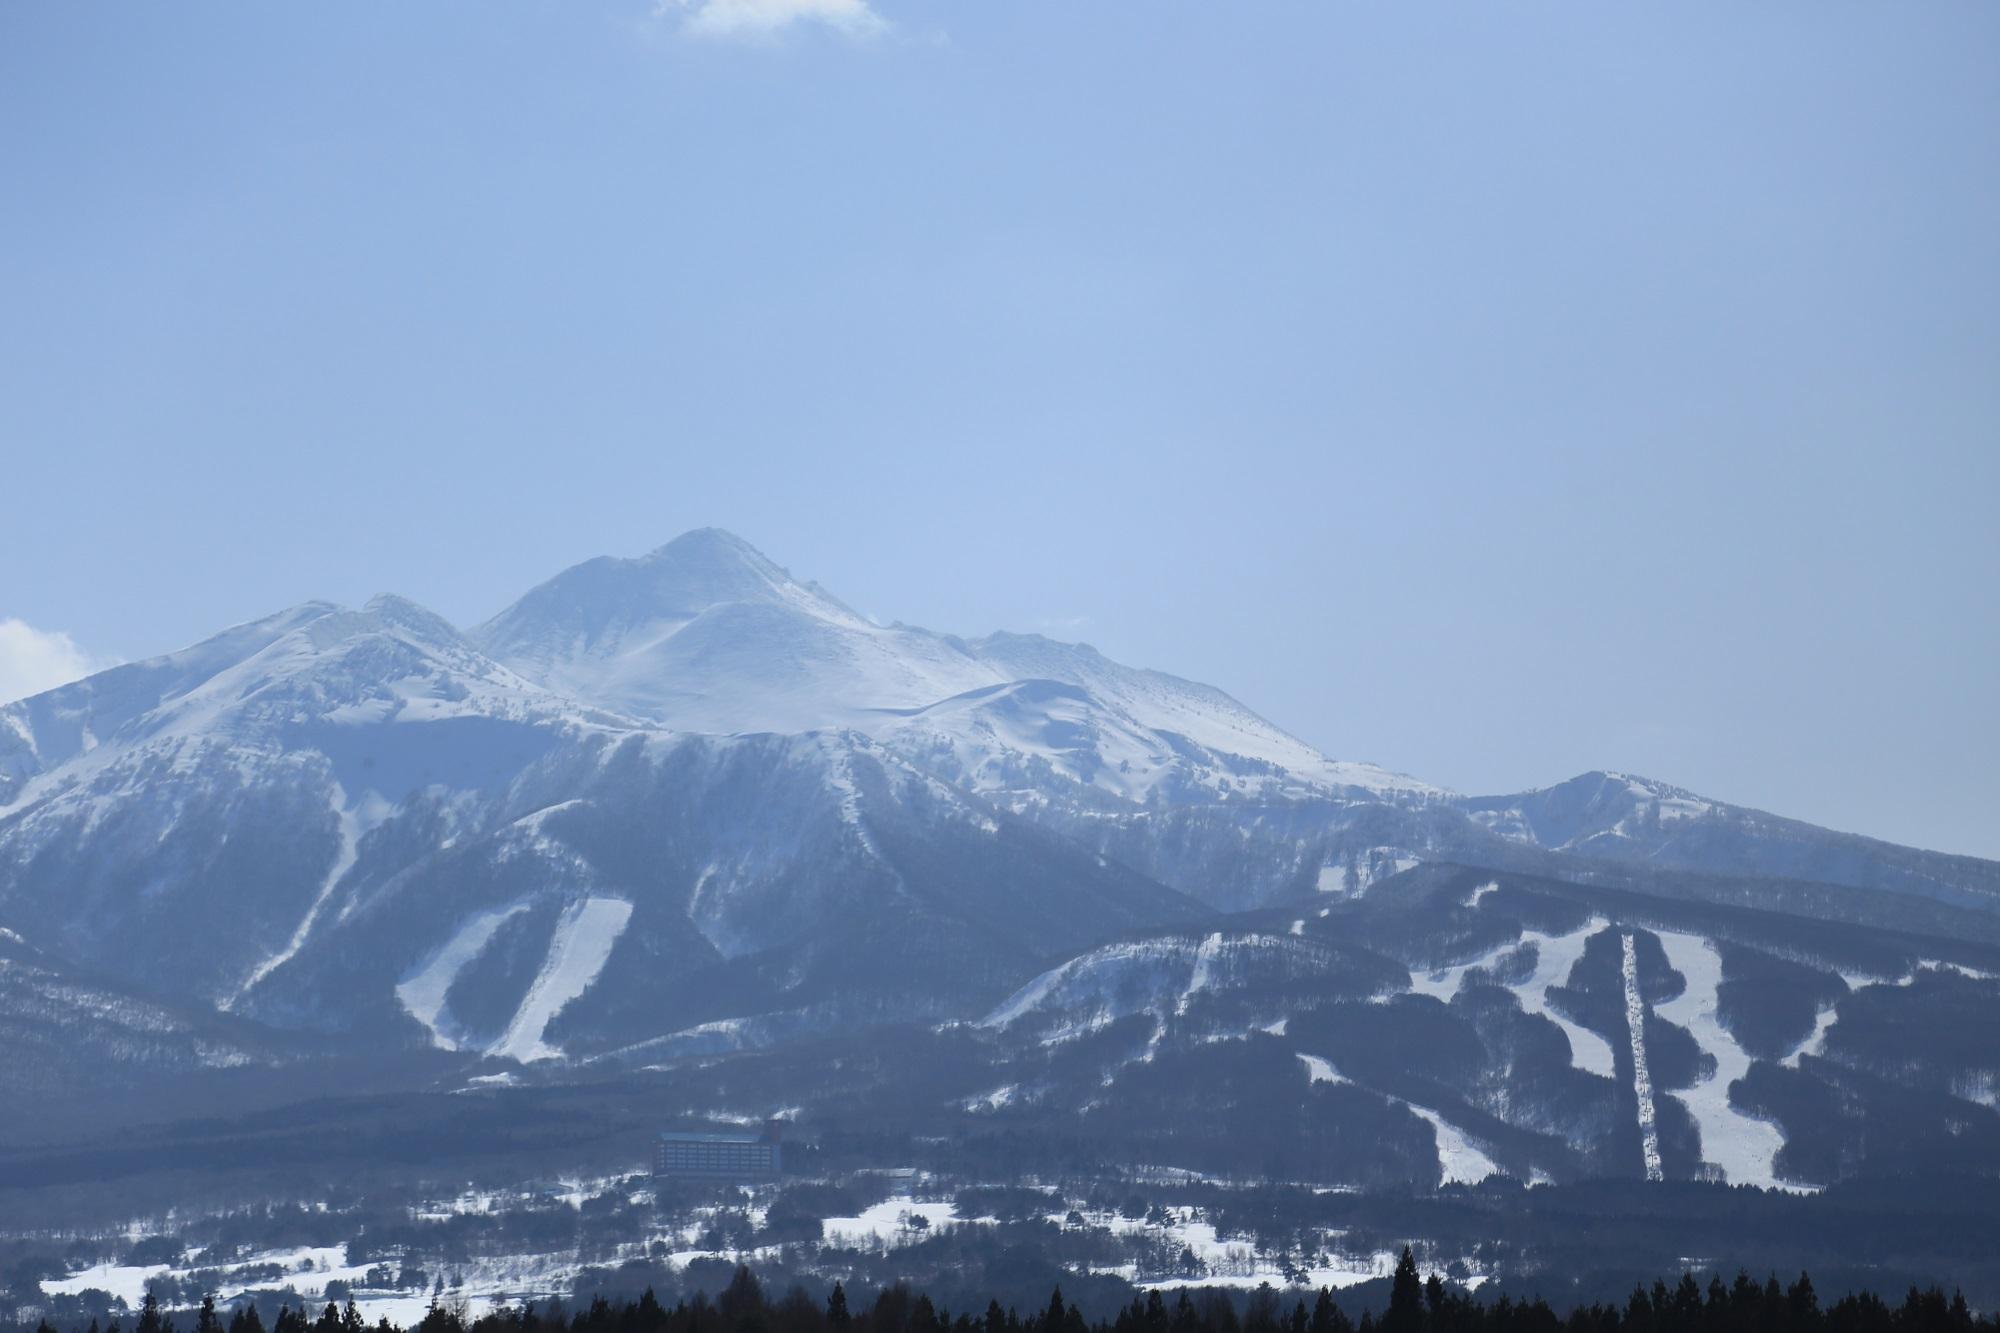 Aomori Spring Resort